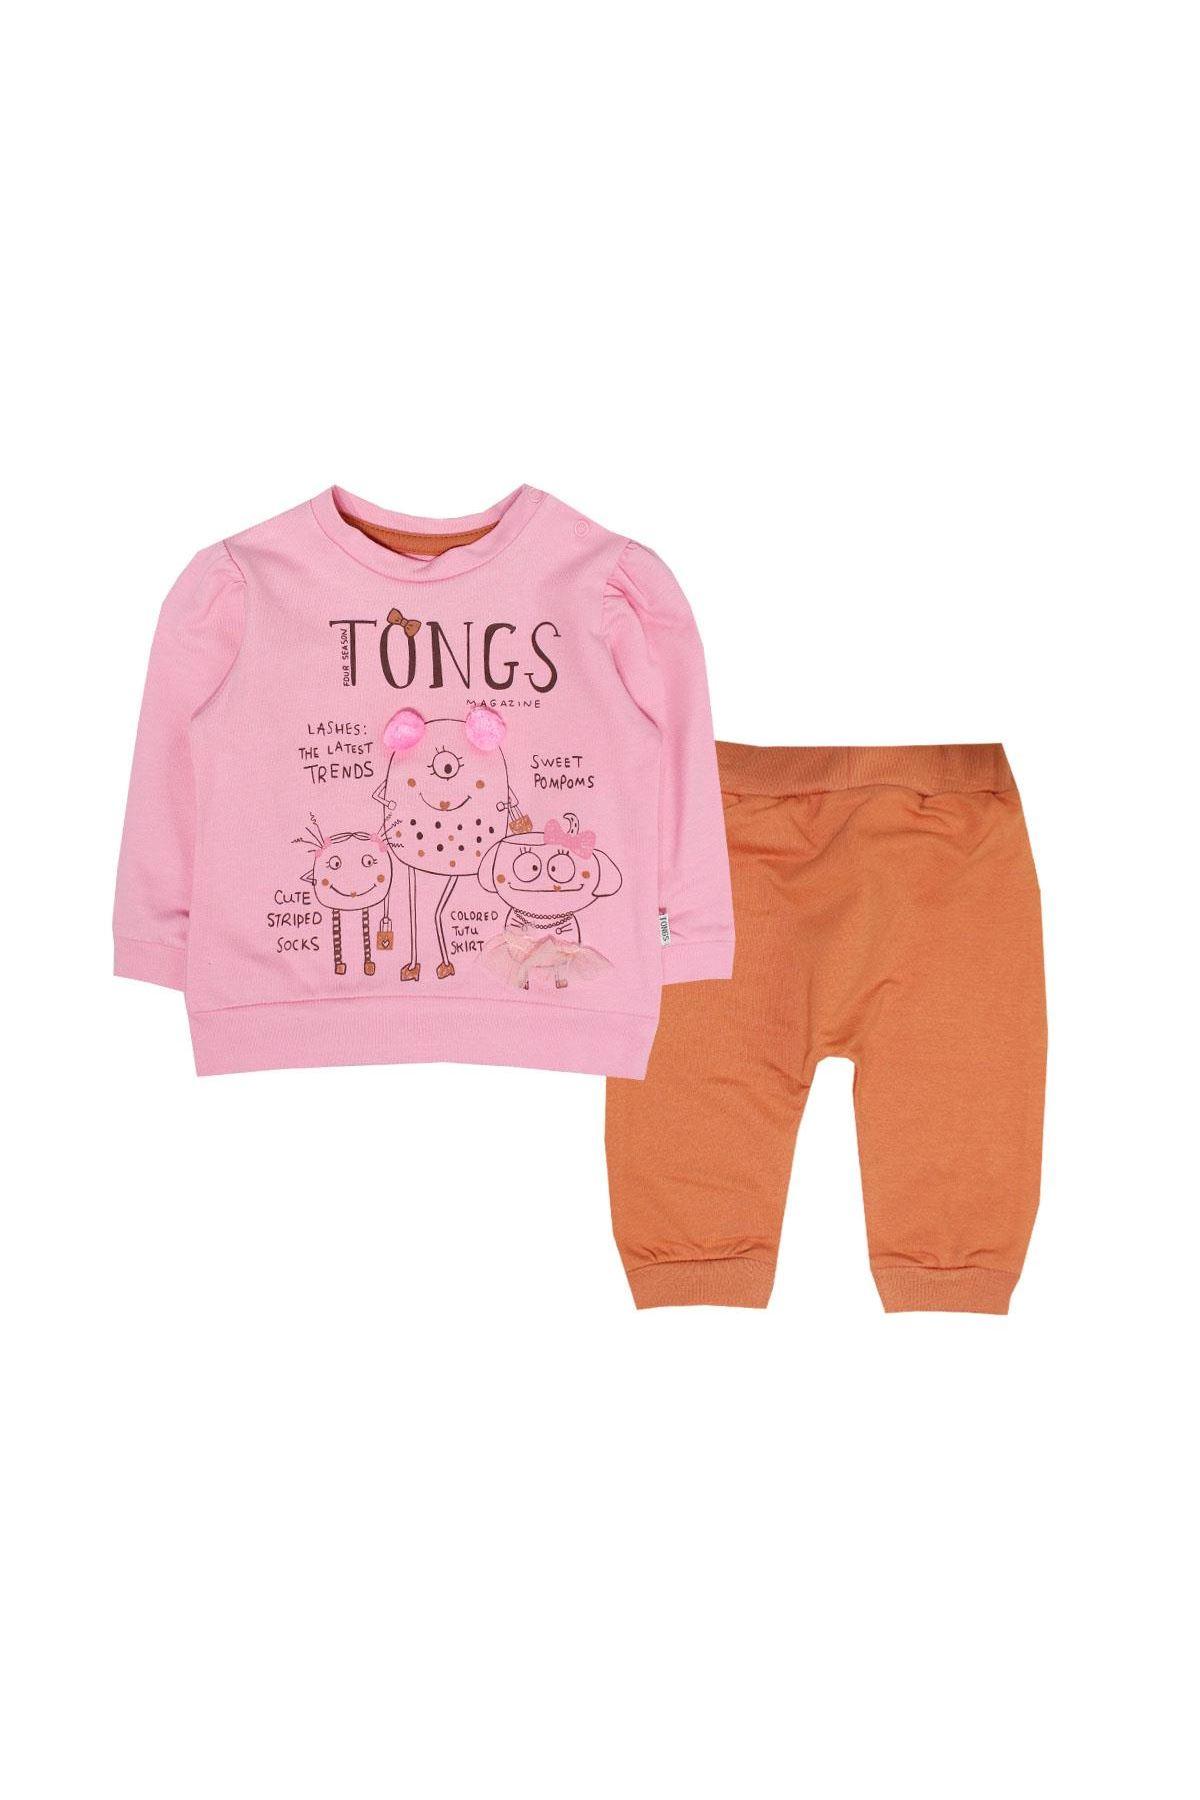 Tongs Baby 2li Bebe Takım 2633 Pembe